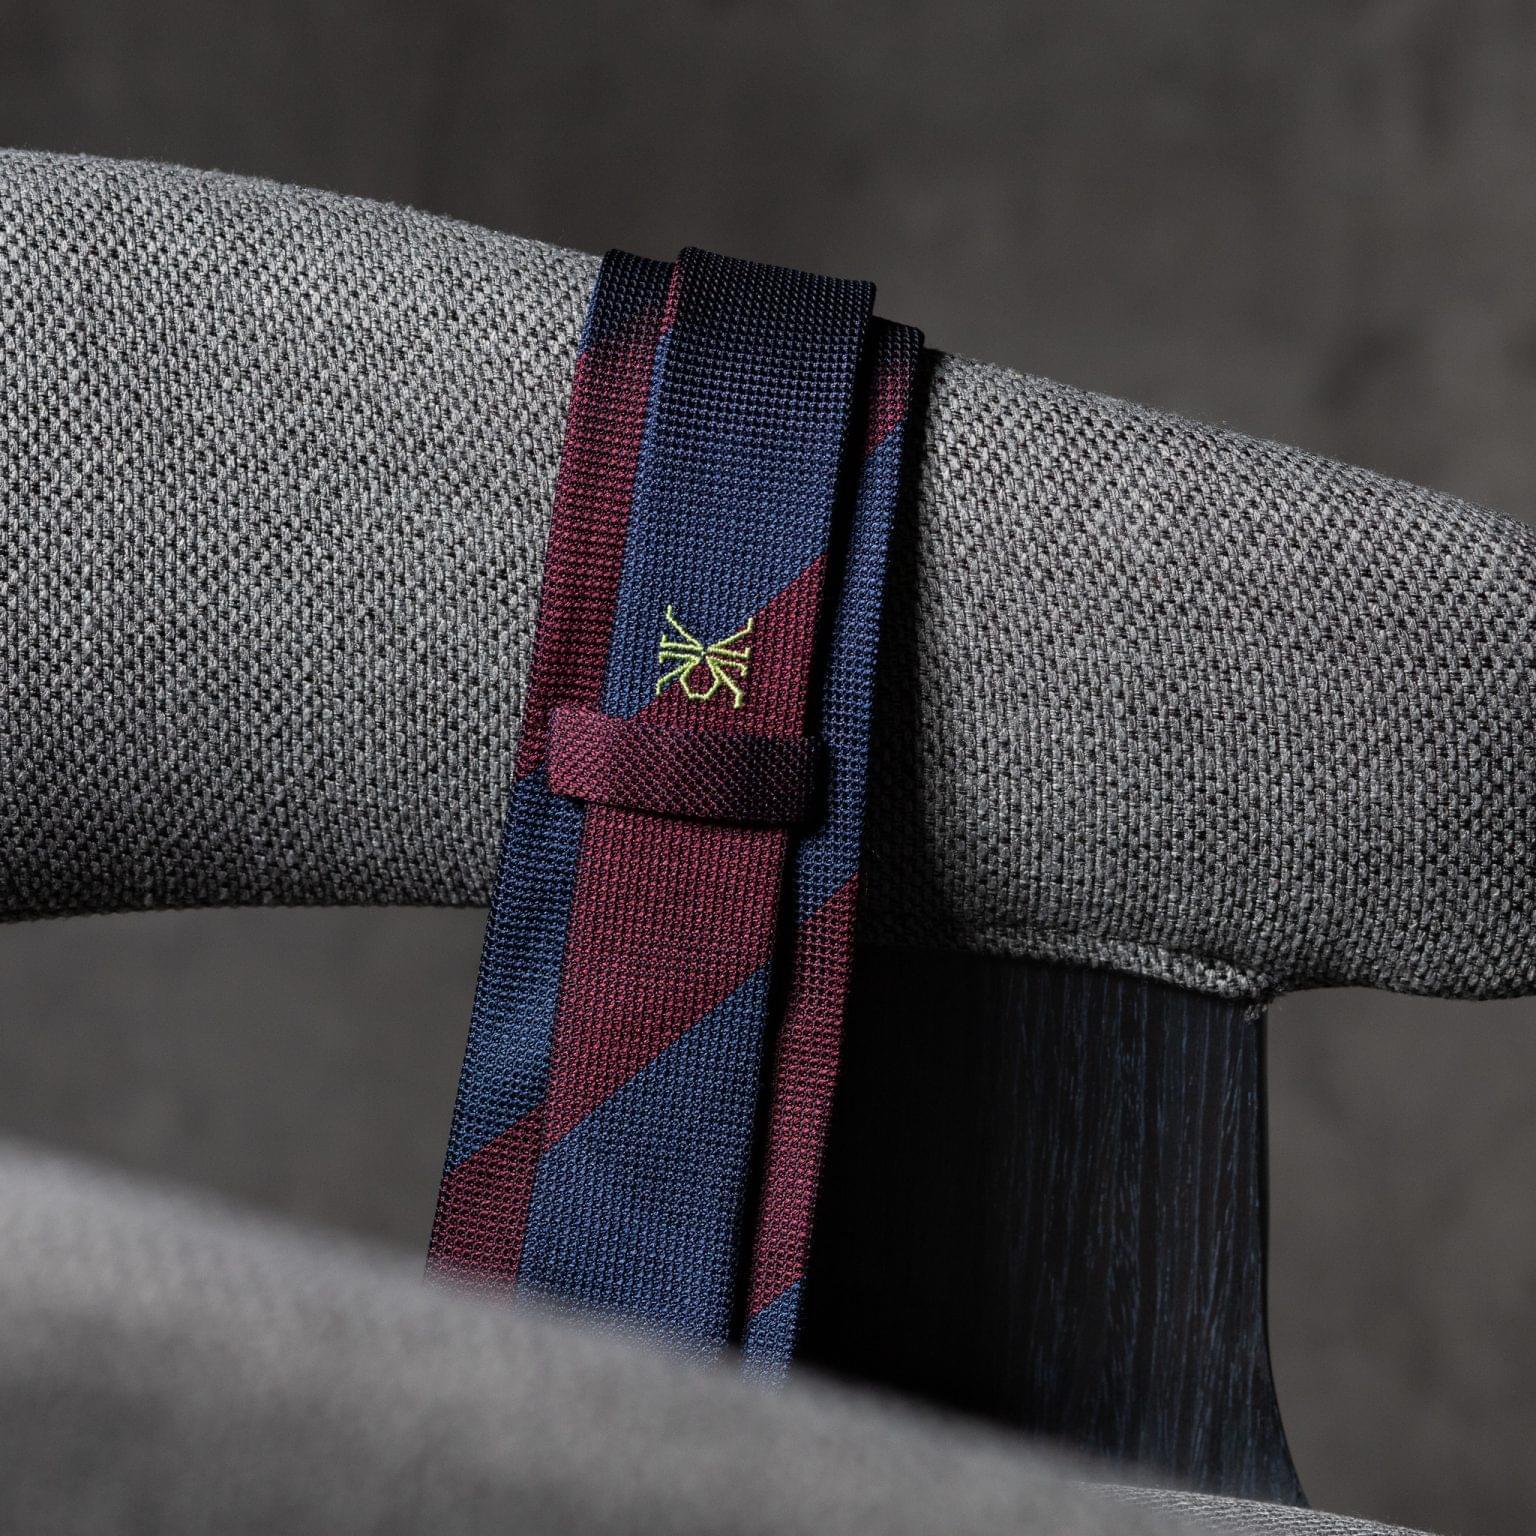 GRENADINE-0357-Tie-Initials-Corbata-Iniciales-The-Seelk-4